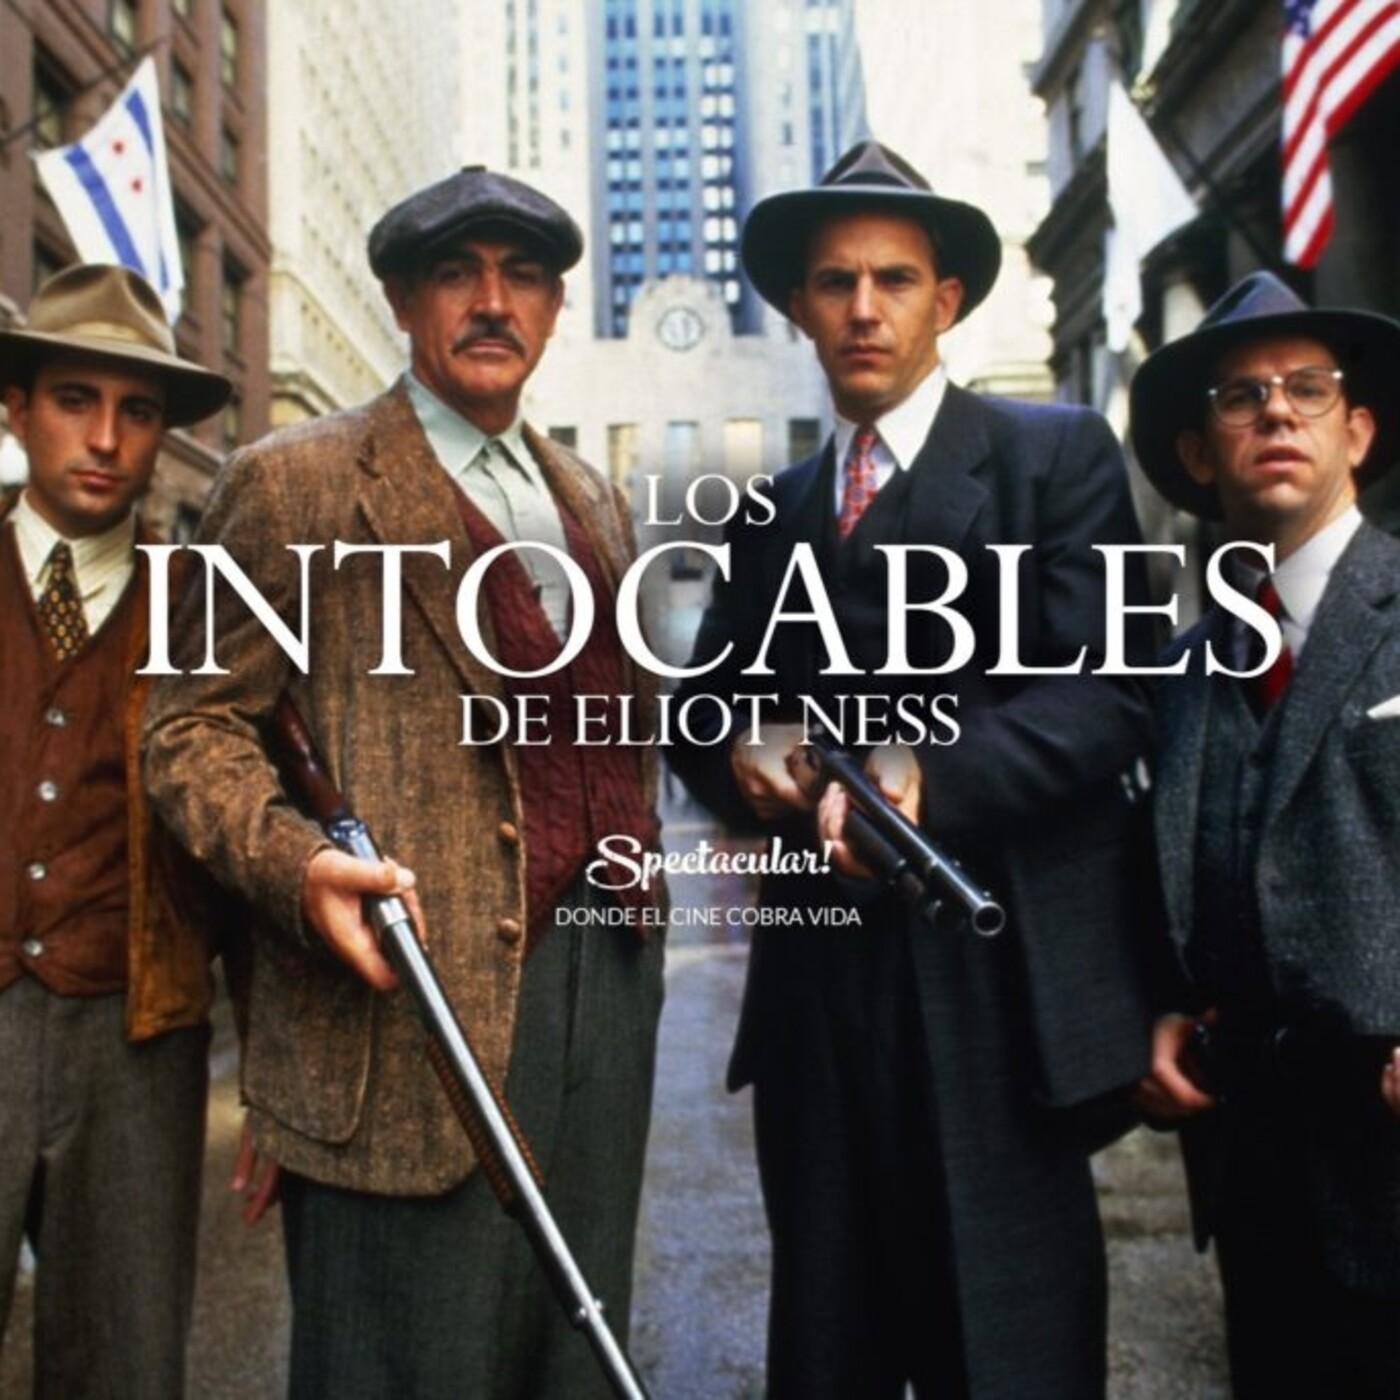 Los Intocables de Eliot Ness (1987) #Acción #Thriller #Drama #peliculas #audesc #podcast